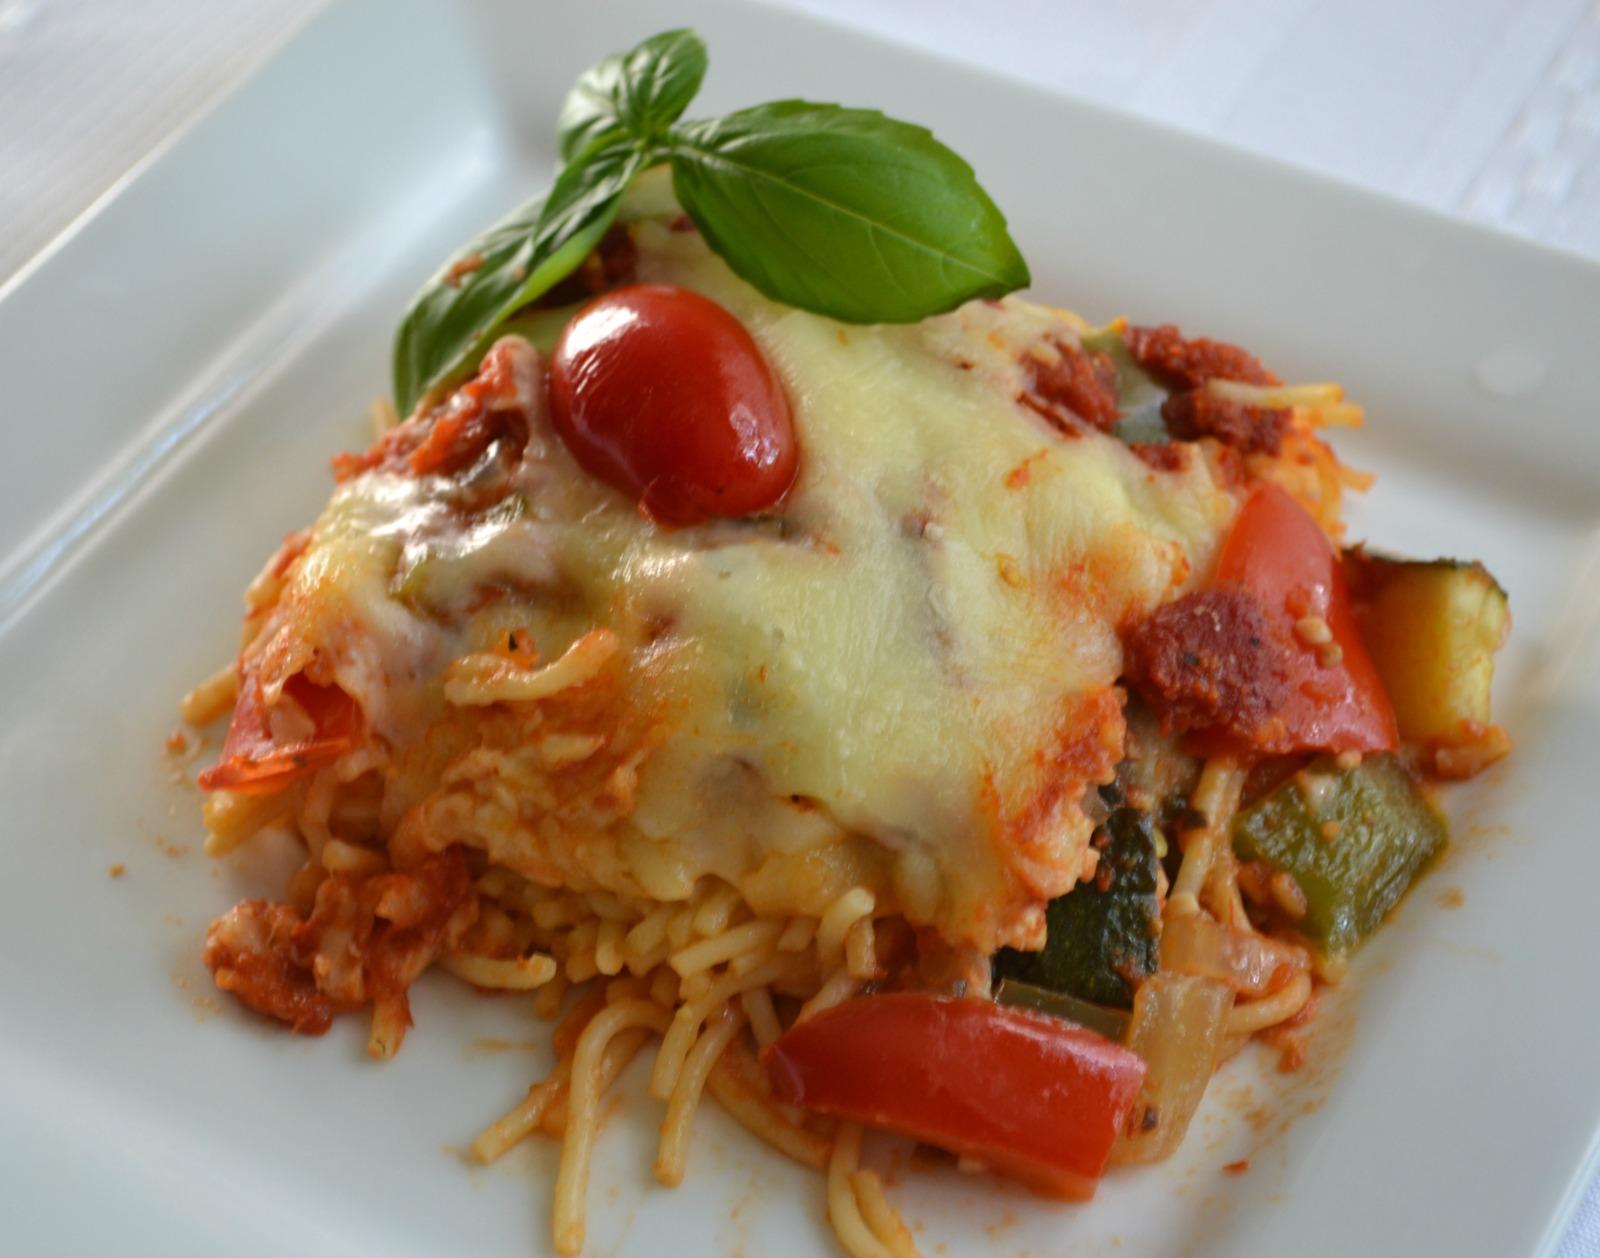 garden patch, spaghetti, pasta, cheese, casserole, vegetables